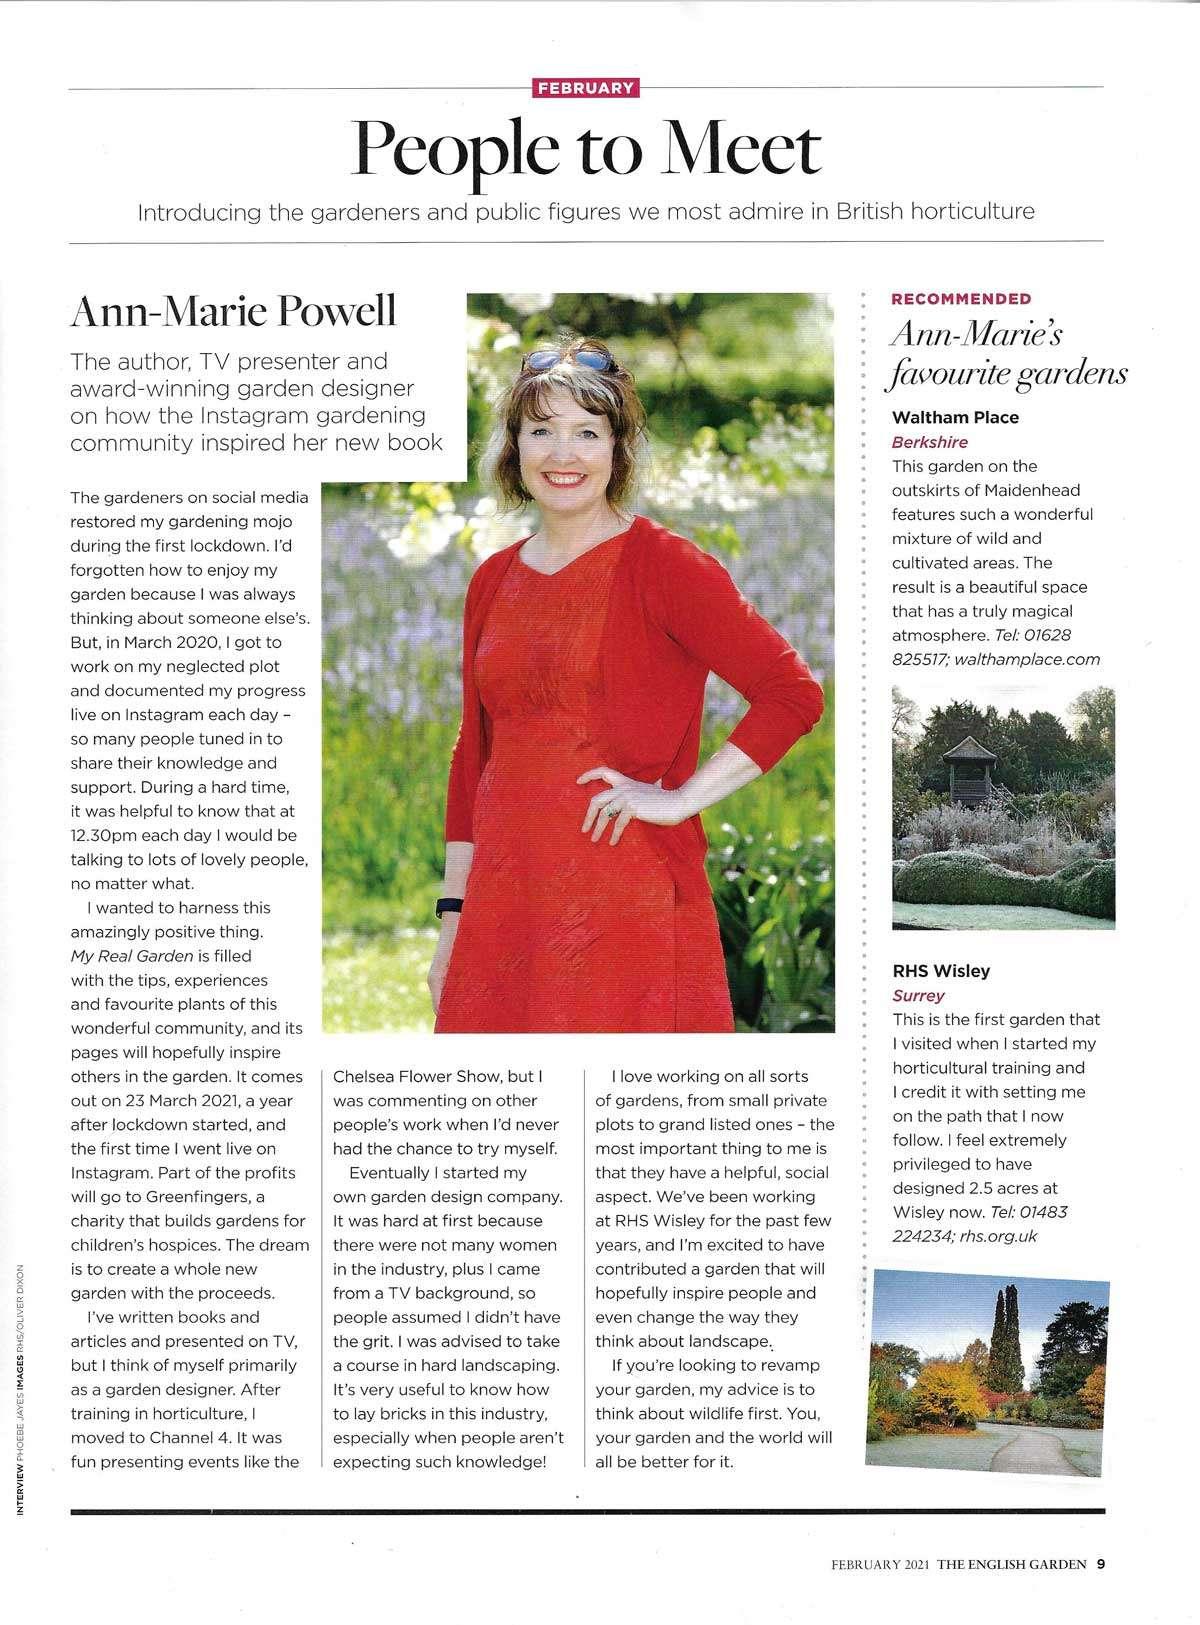 Hampshire designer Ann-Marie Powell in The English Garden magazine February 2021